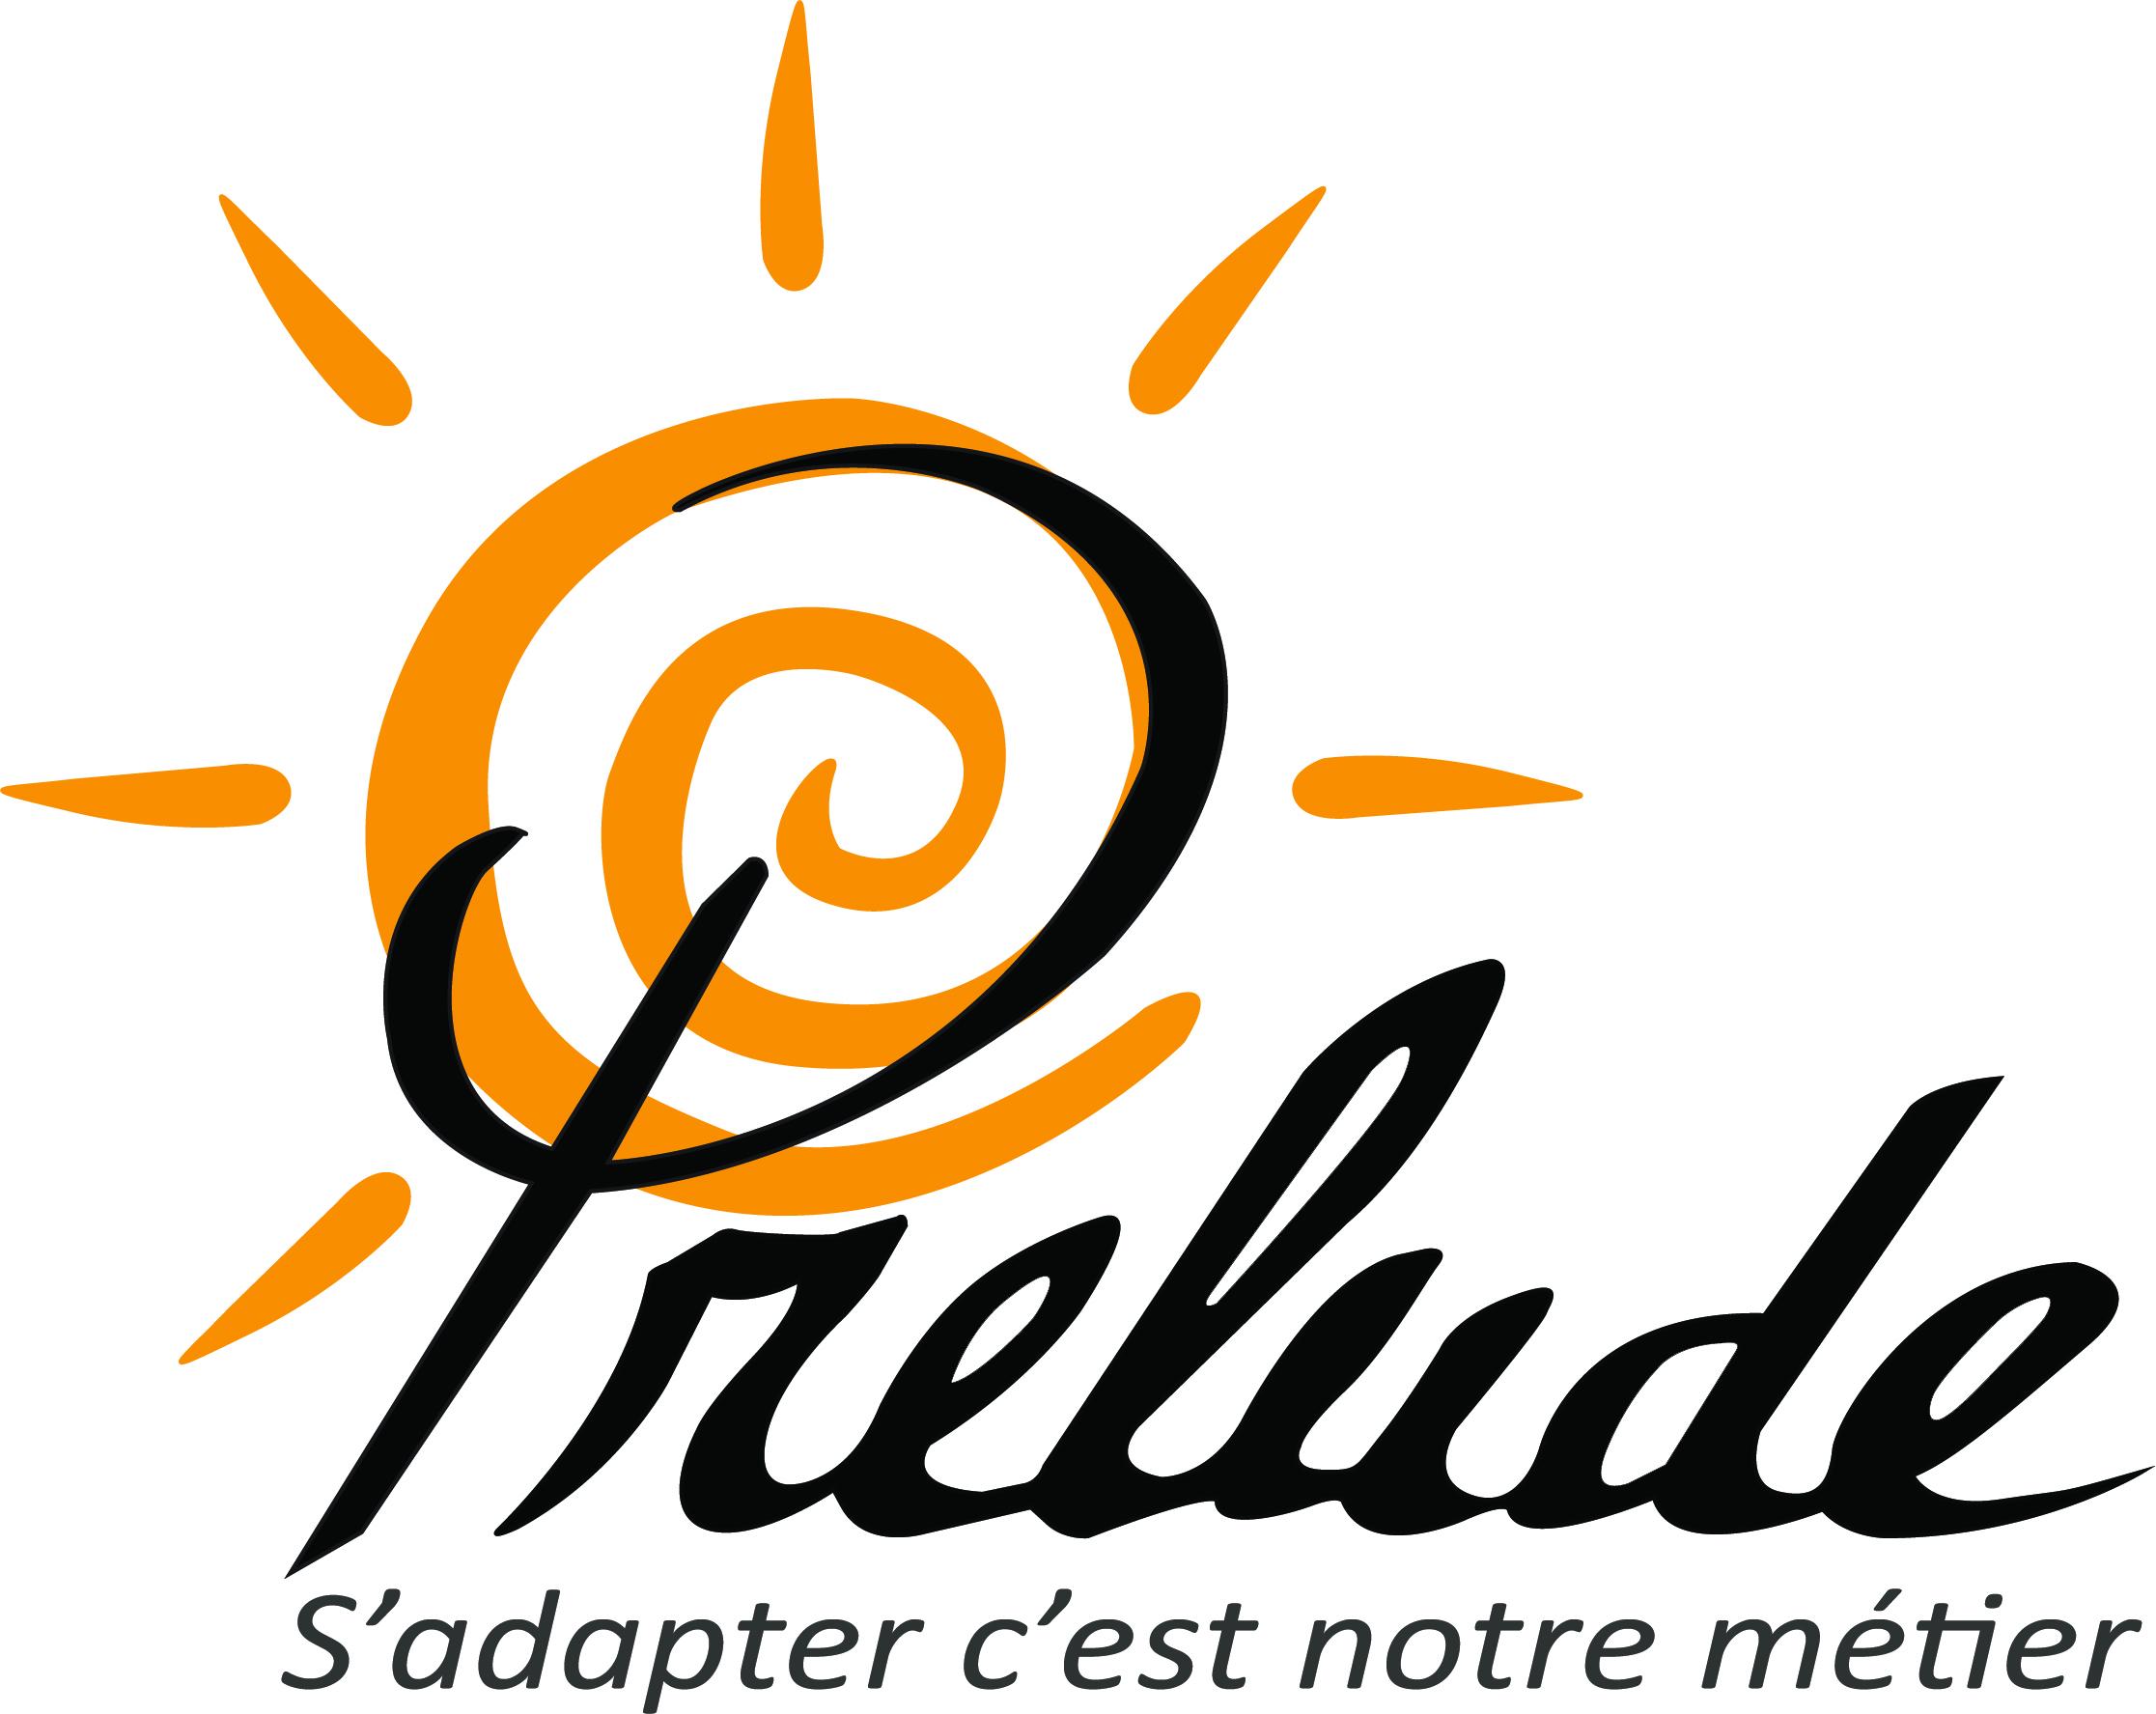 Logo Prélude s'adapter c'est notre métier.jpg